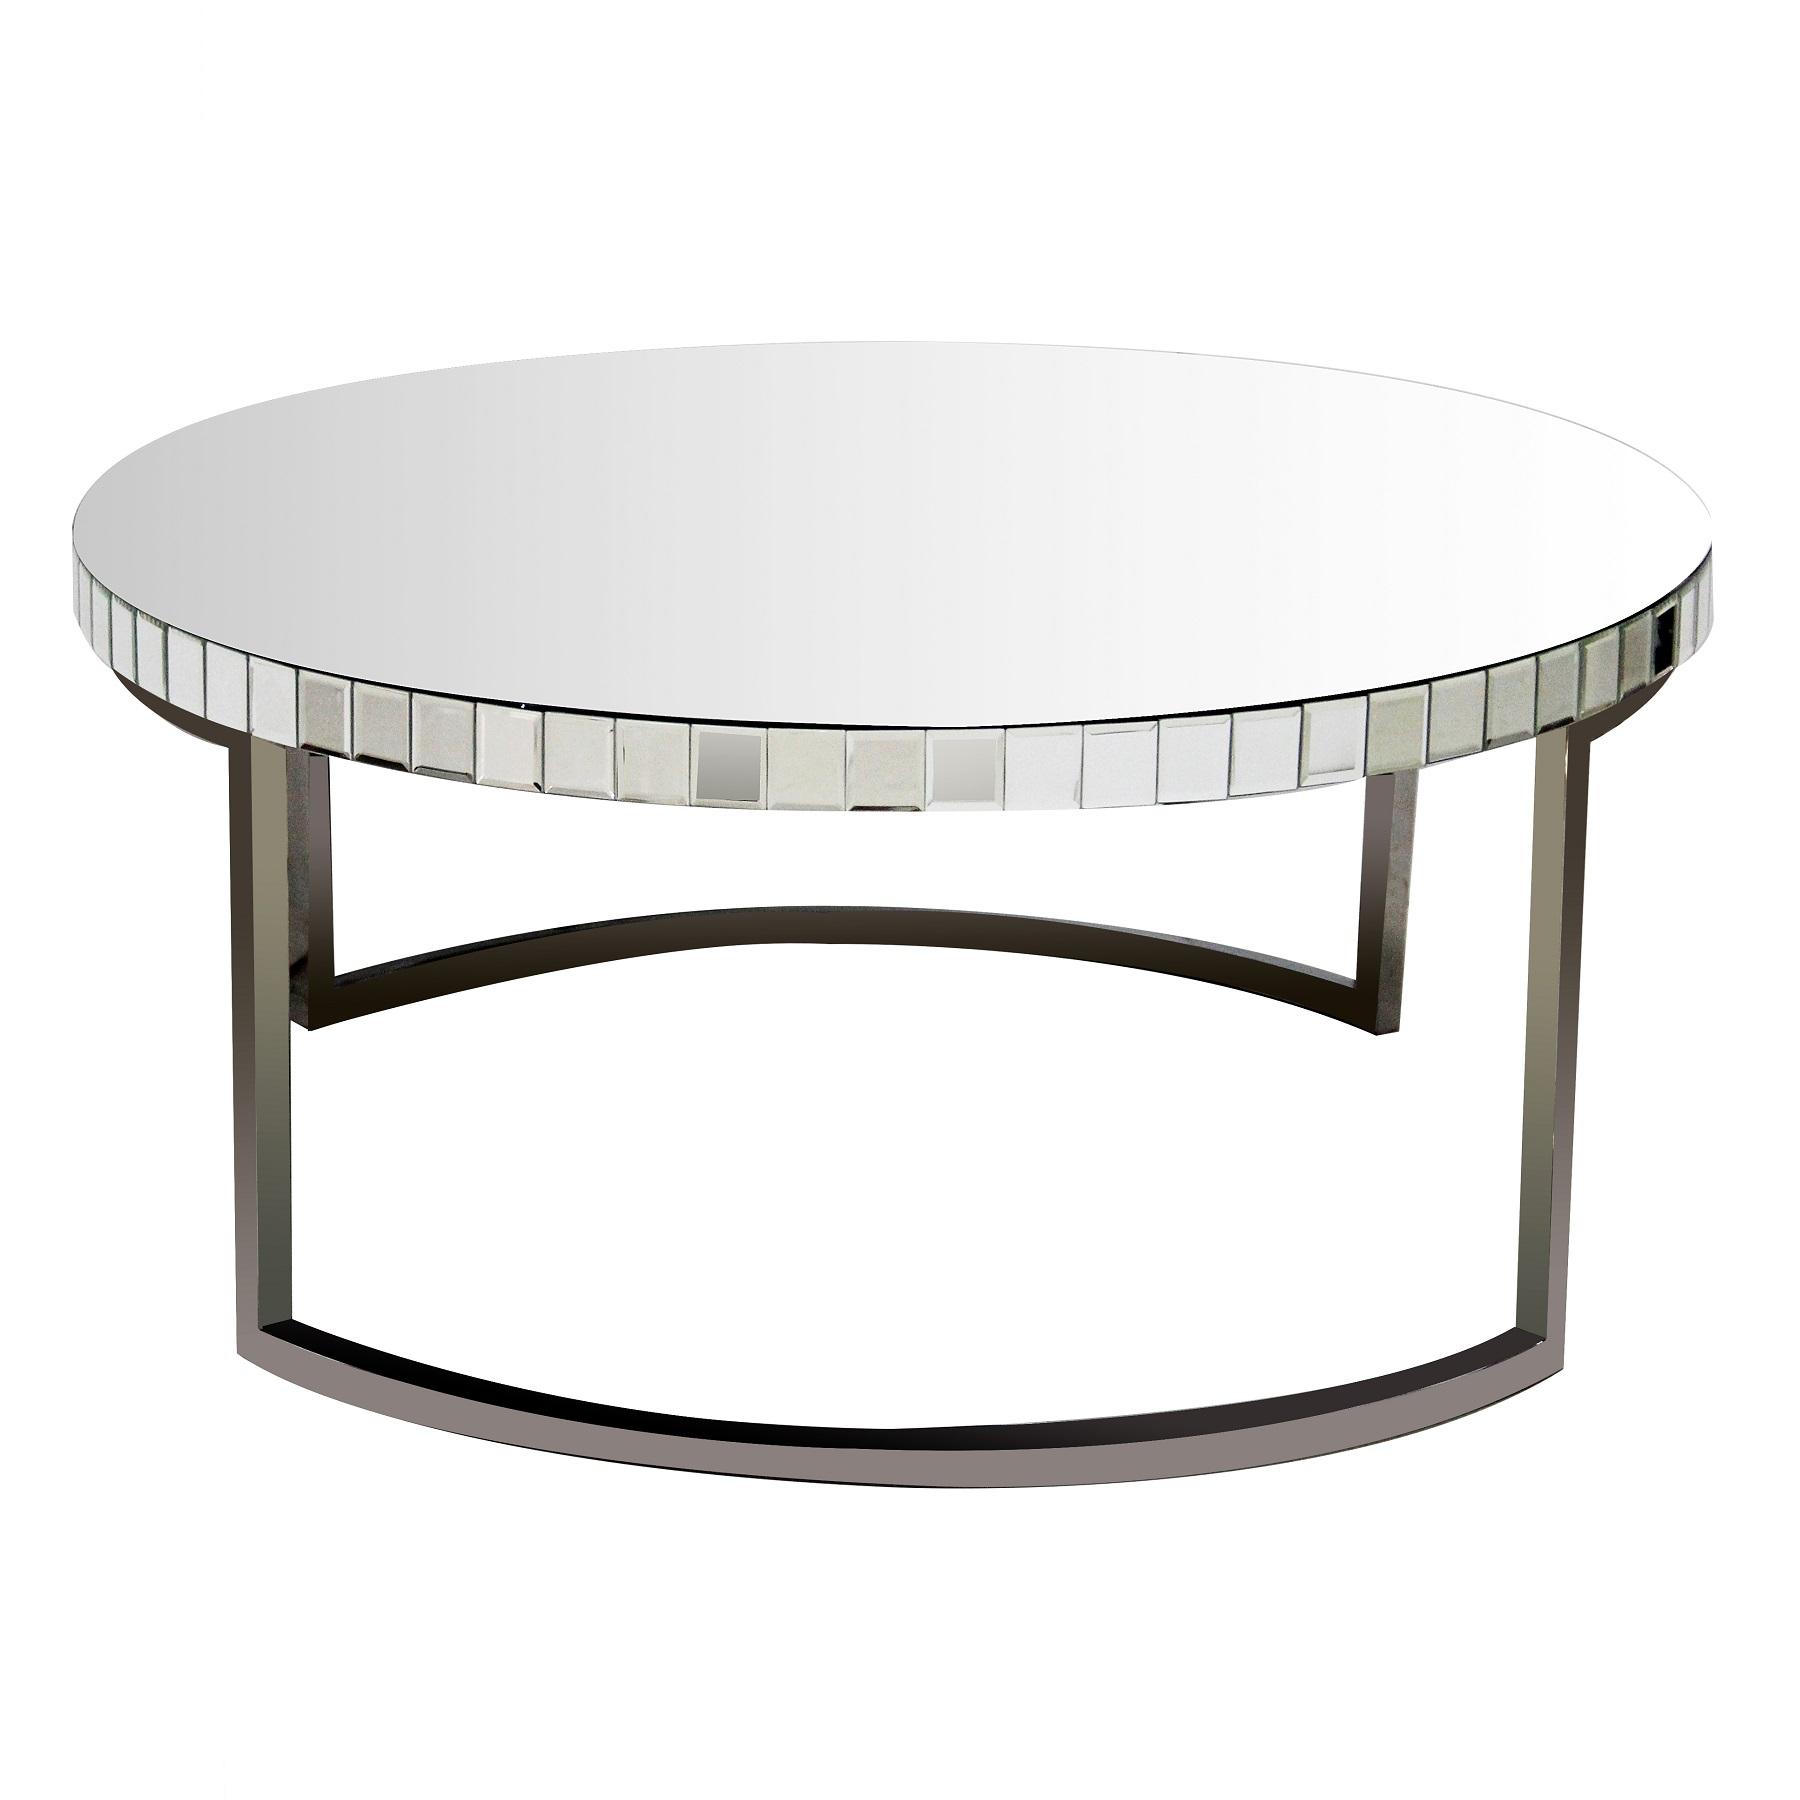 Зеркальный кофейный столик Bolshevico